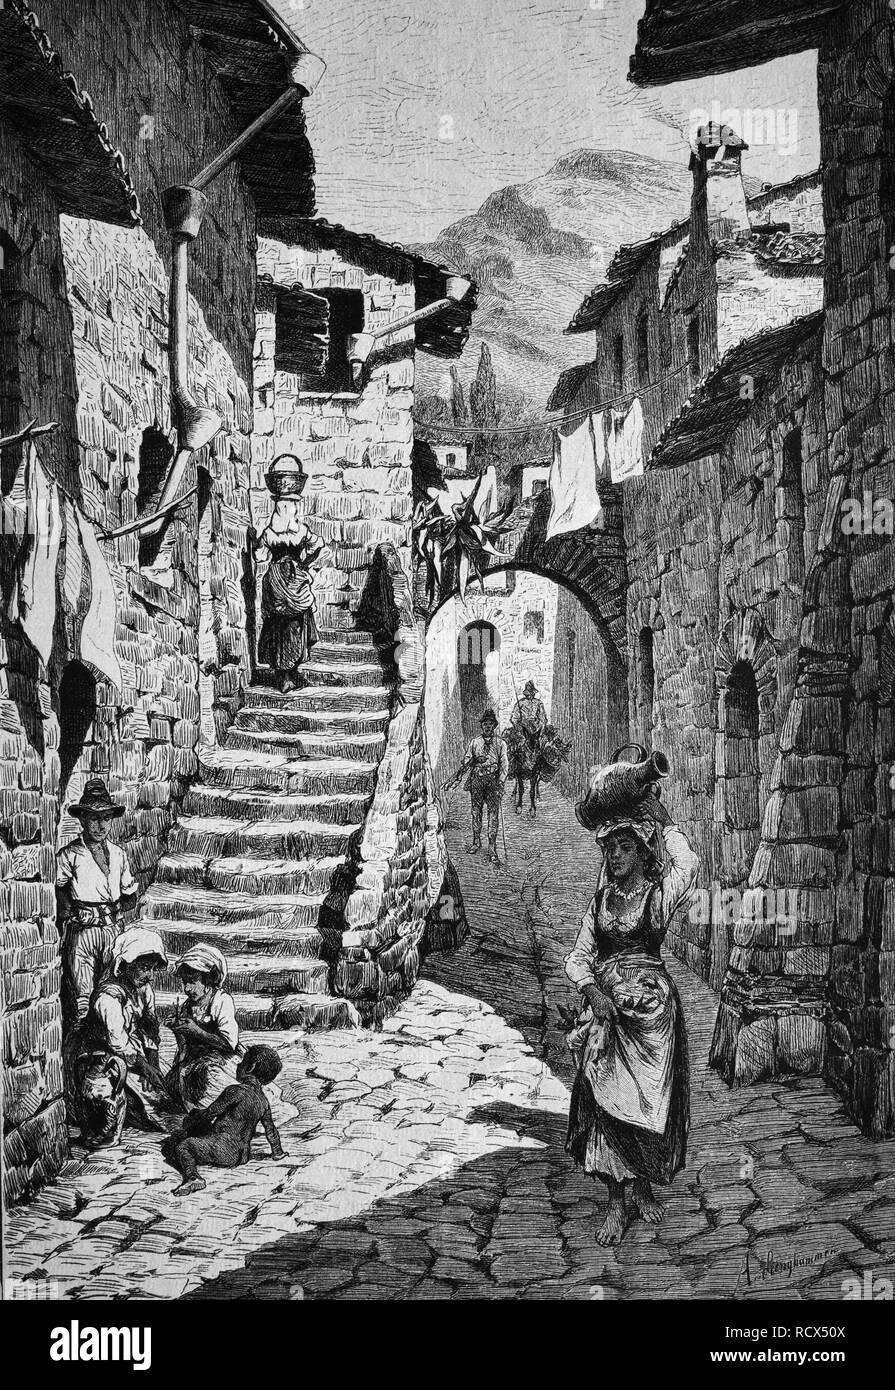 Main street in Gori, the regional capital of Shida Kartli, eastern Georgia, wood engraving, 1880 - Stock Image